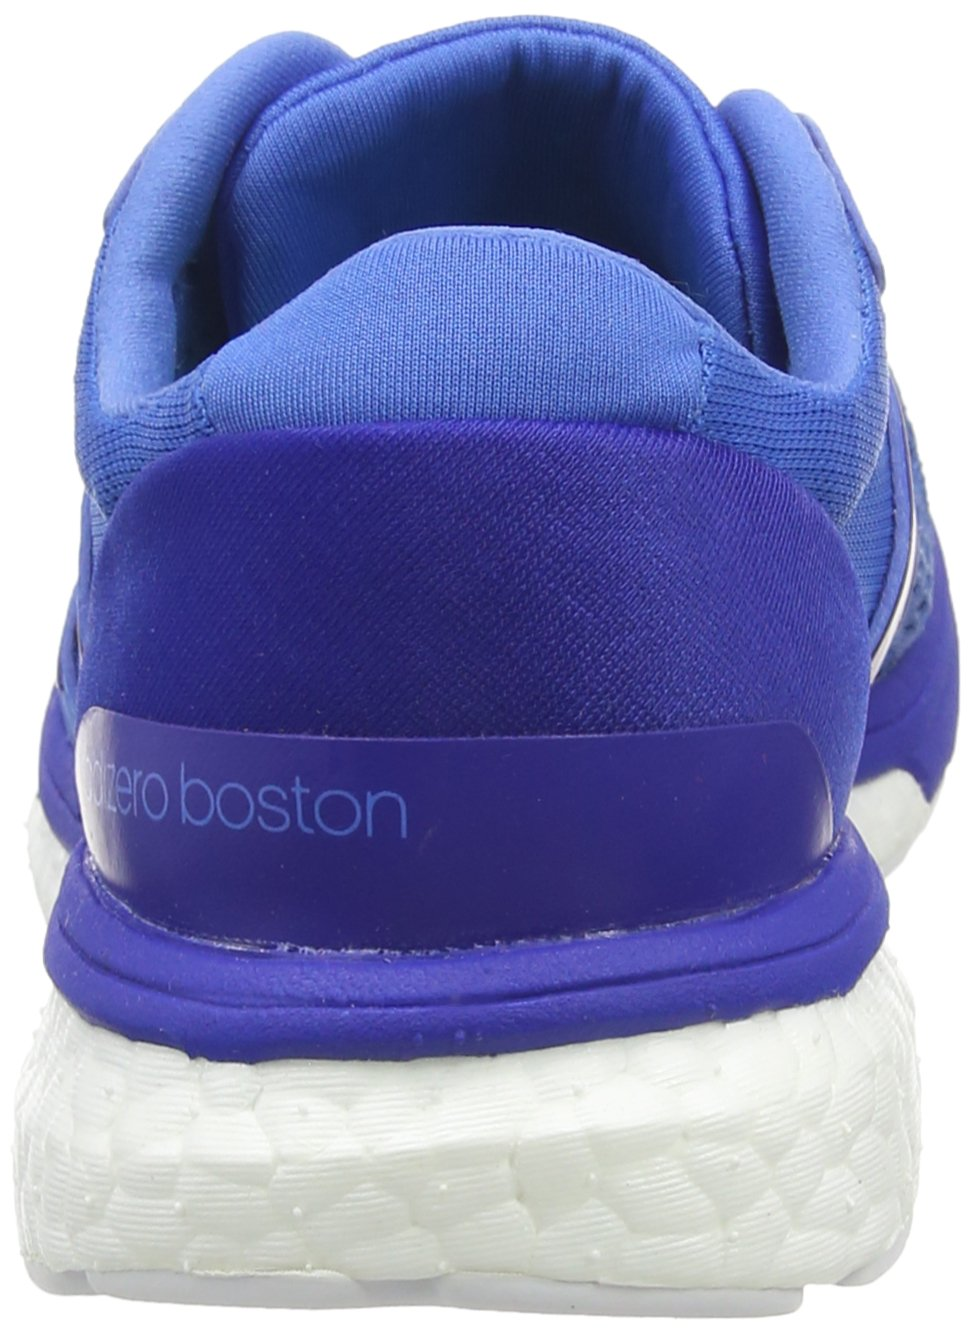 71pIvPUbtgL - adidas Women's Adizero Boston 6 Competition Running Shoes